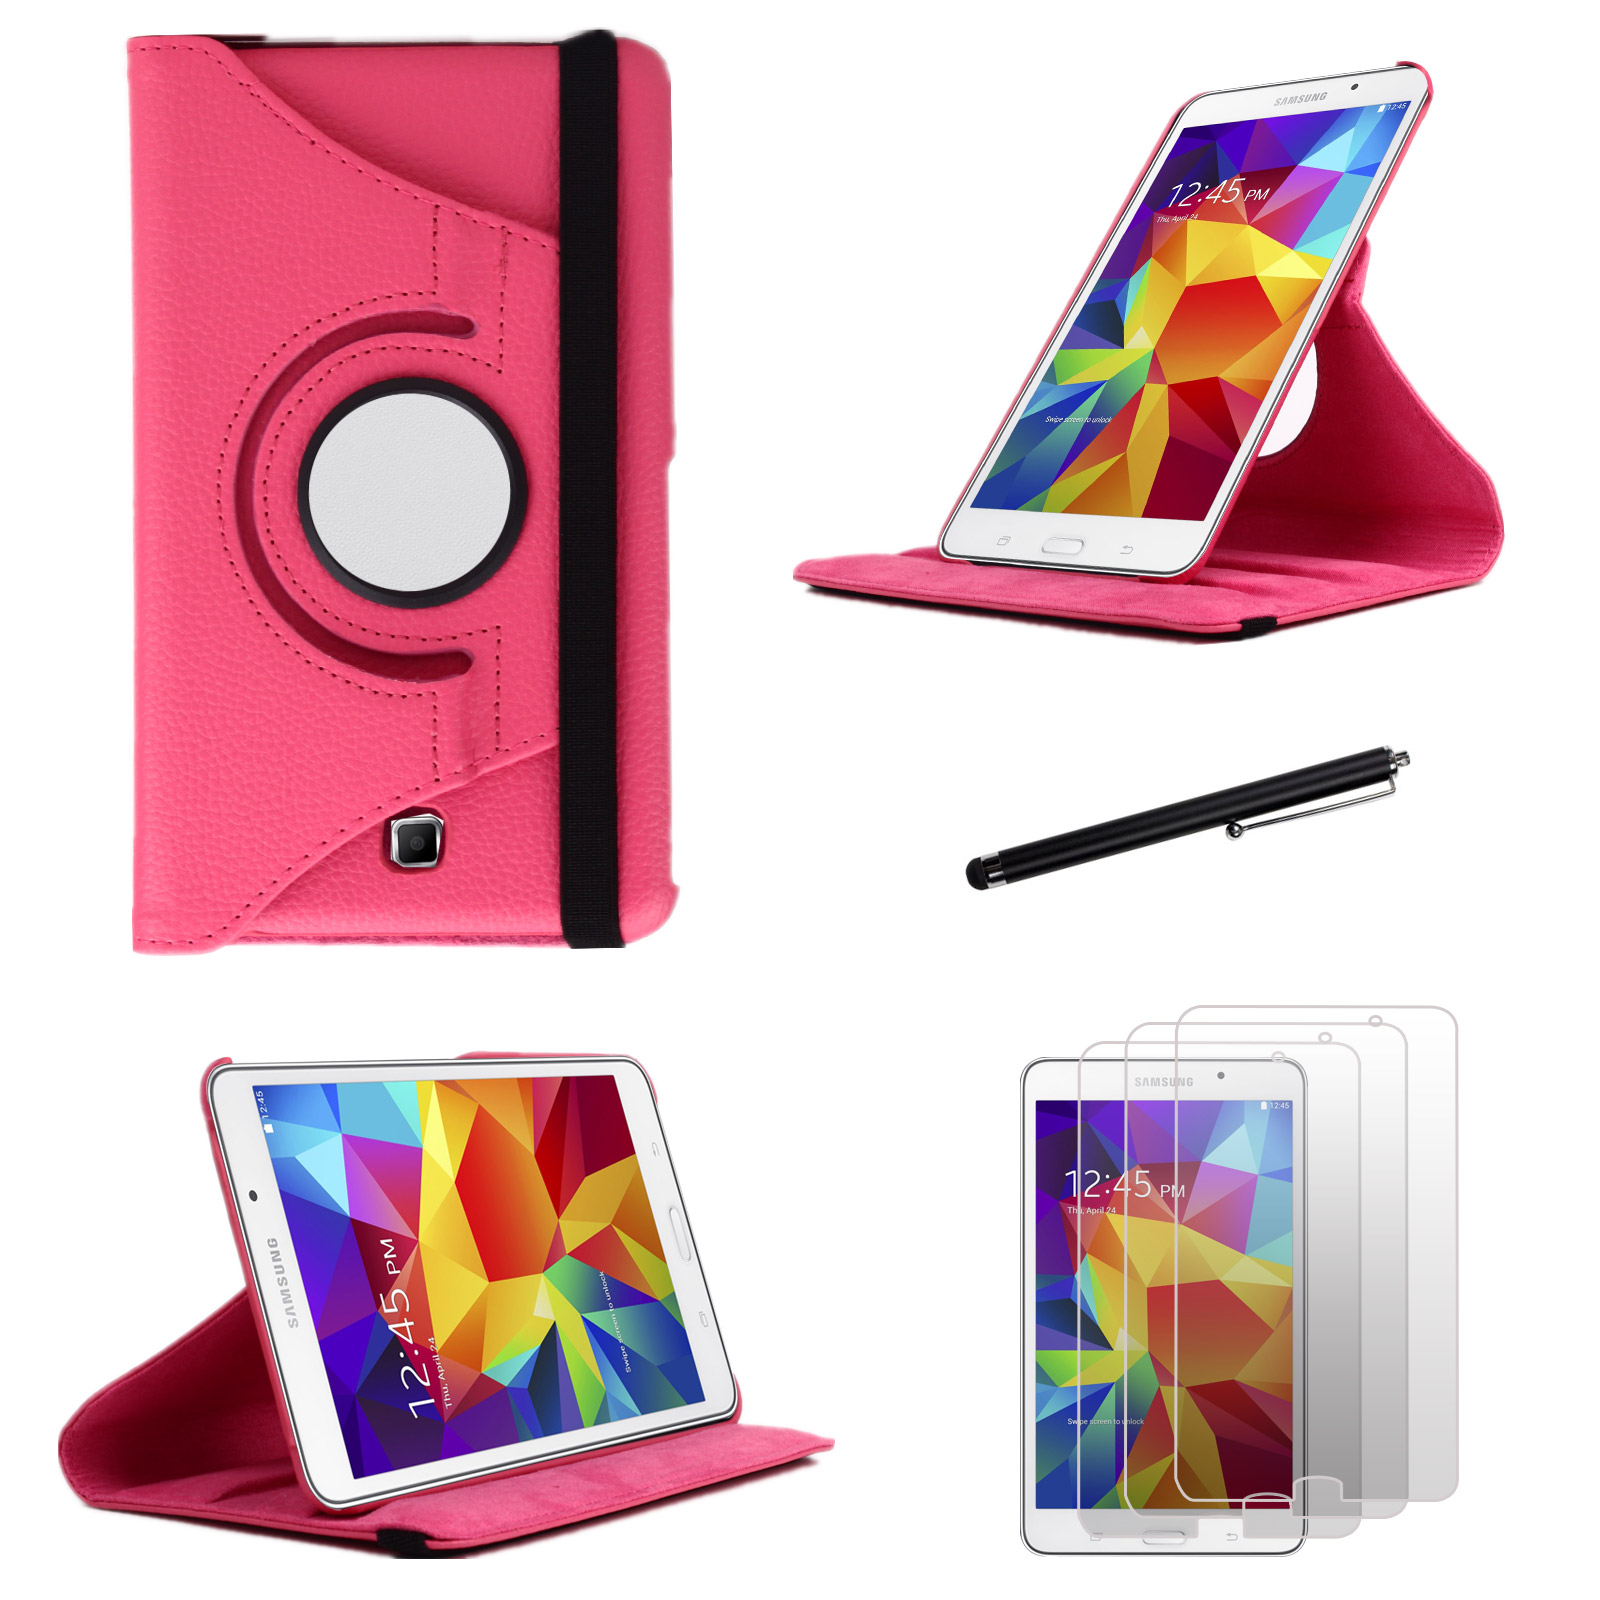 EEEKit for Samsung Galaxy Tab 4 8.0 T330,Rotating Stand Case+Screen Film+Stylus at Sears.com